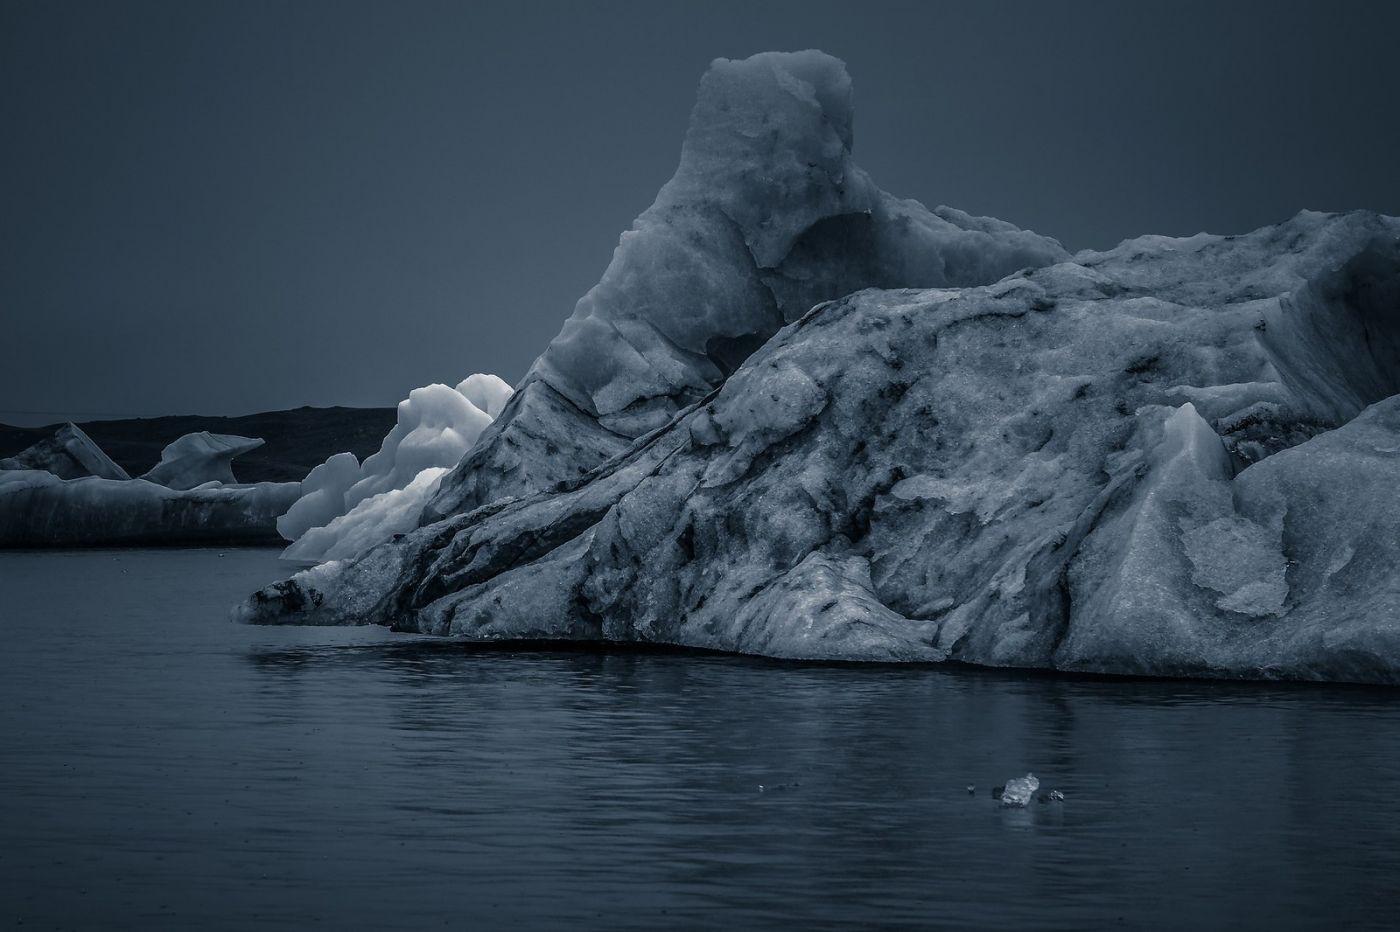 冰岛冰川泻湖(Glacier Lagoon),流动的冰川_图1-23